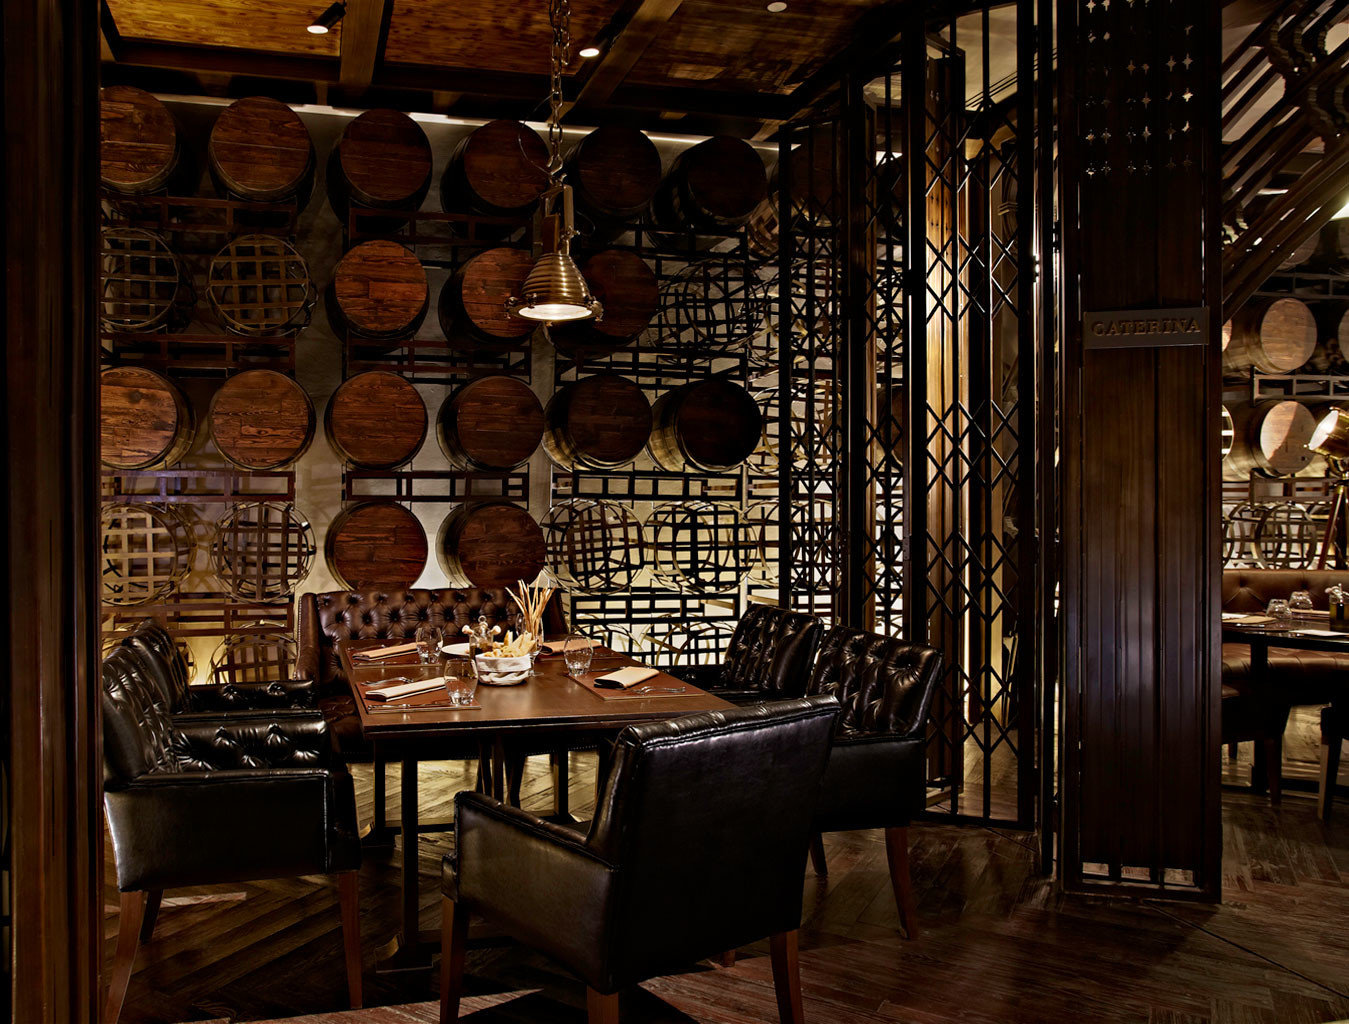 City Dining Drink Eat Elegant Hotels Nightlife Scenic views Shop indoor floor room Winery restaurant Bar interior design lighting estate wine cellar tavern basement